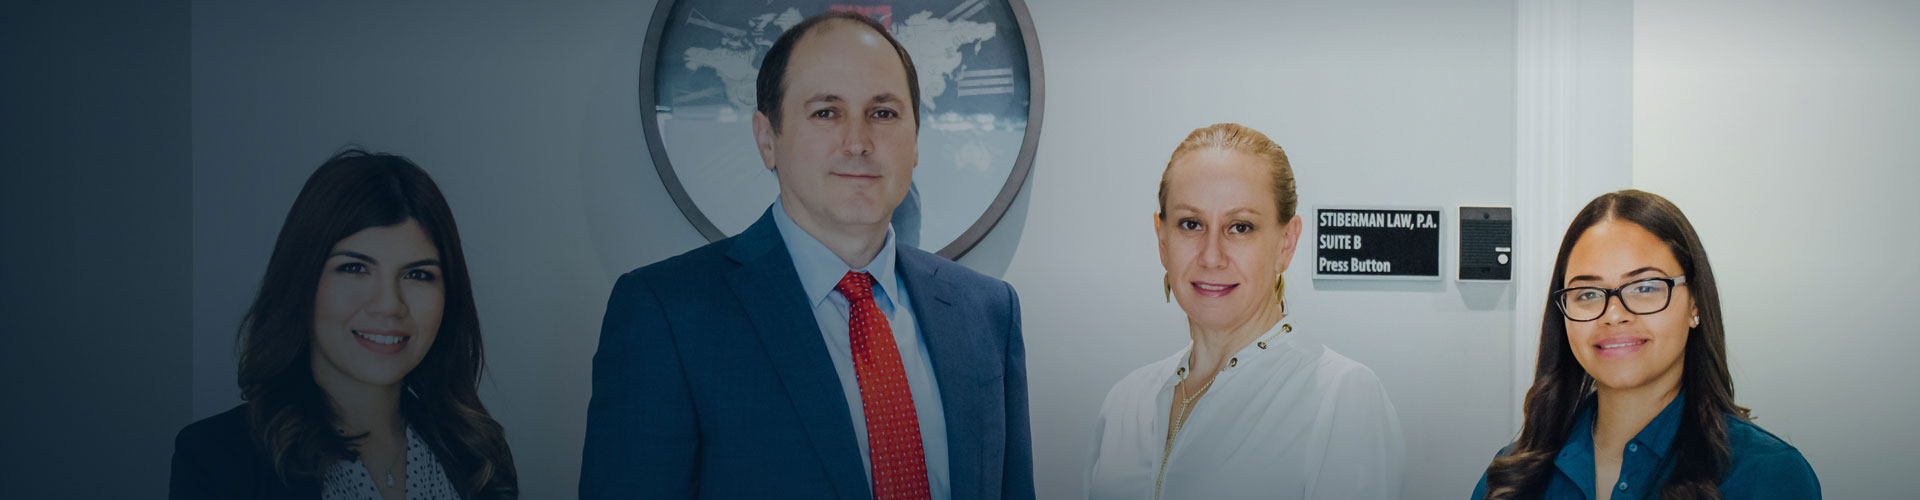 Miami Debt Consolidation Attorneys - Stiberman Law Firm